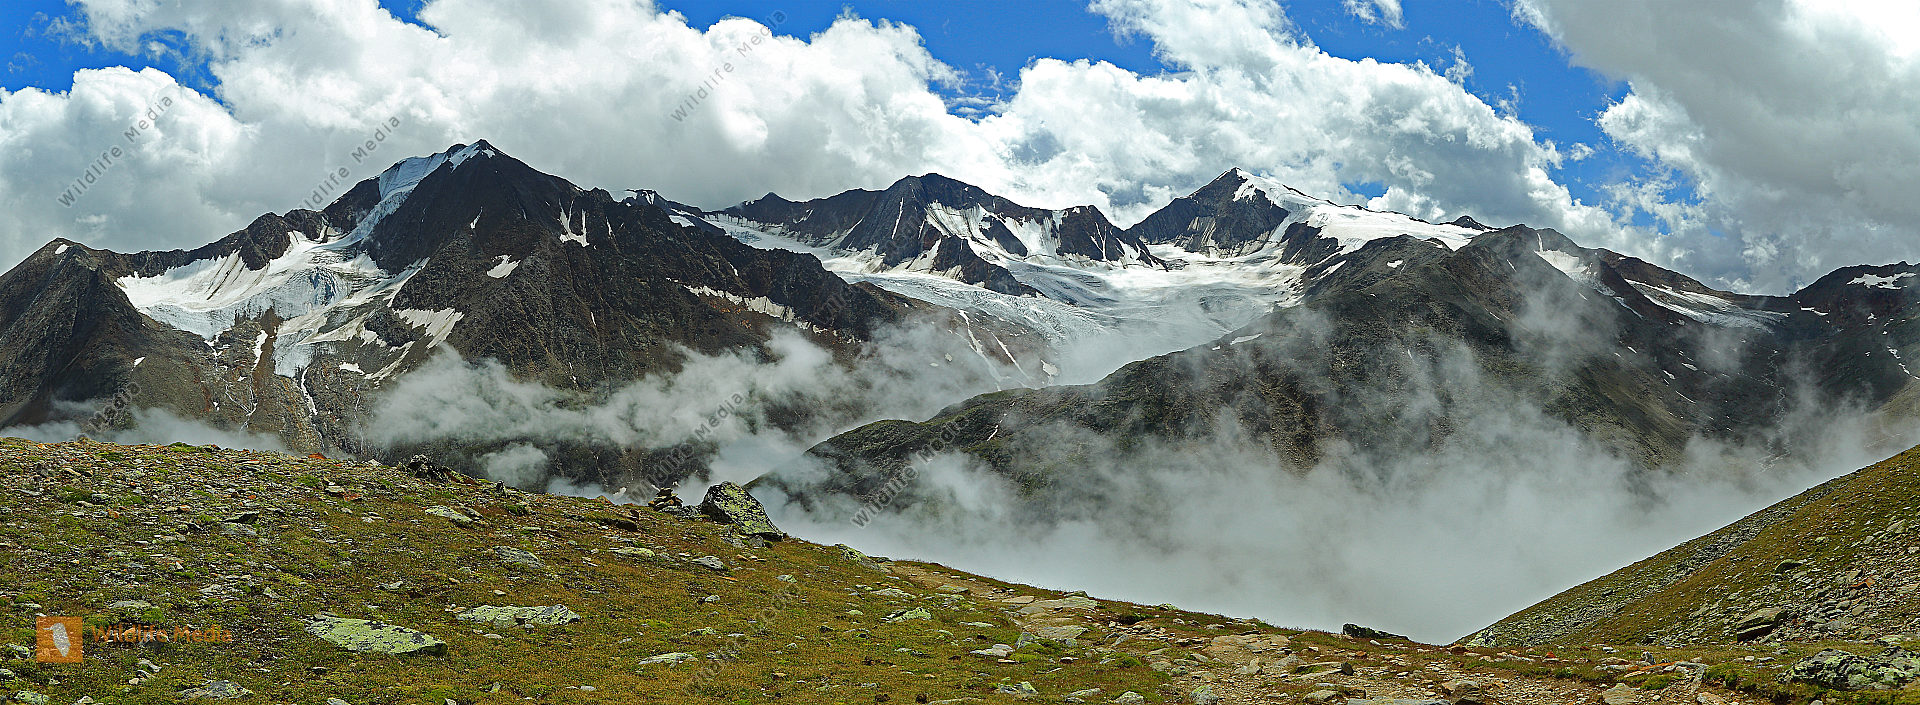 Ötztaler Alpen Panorama